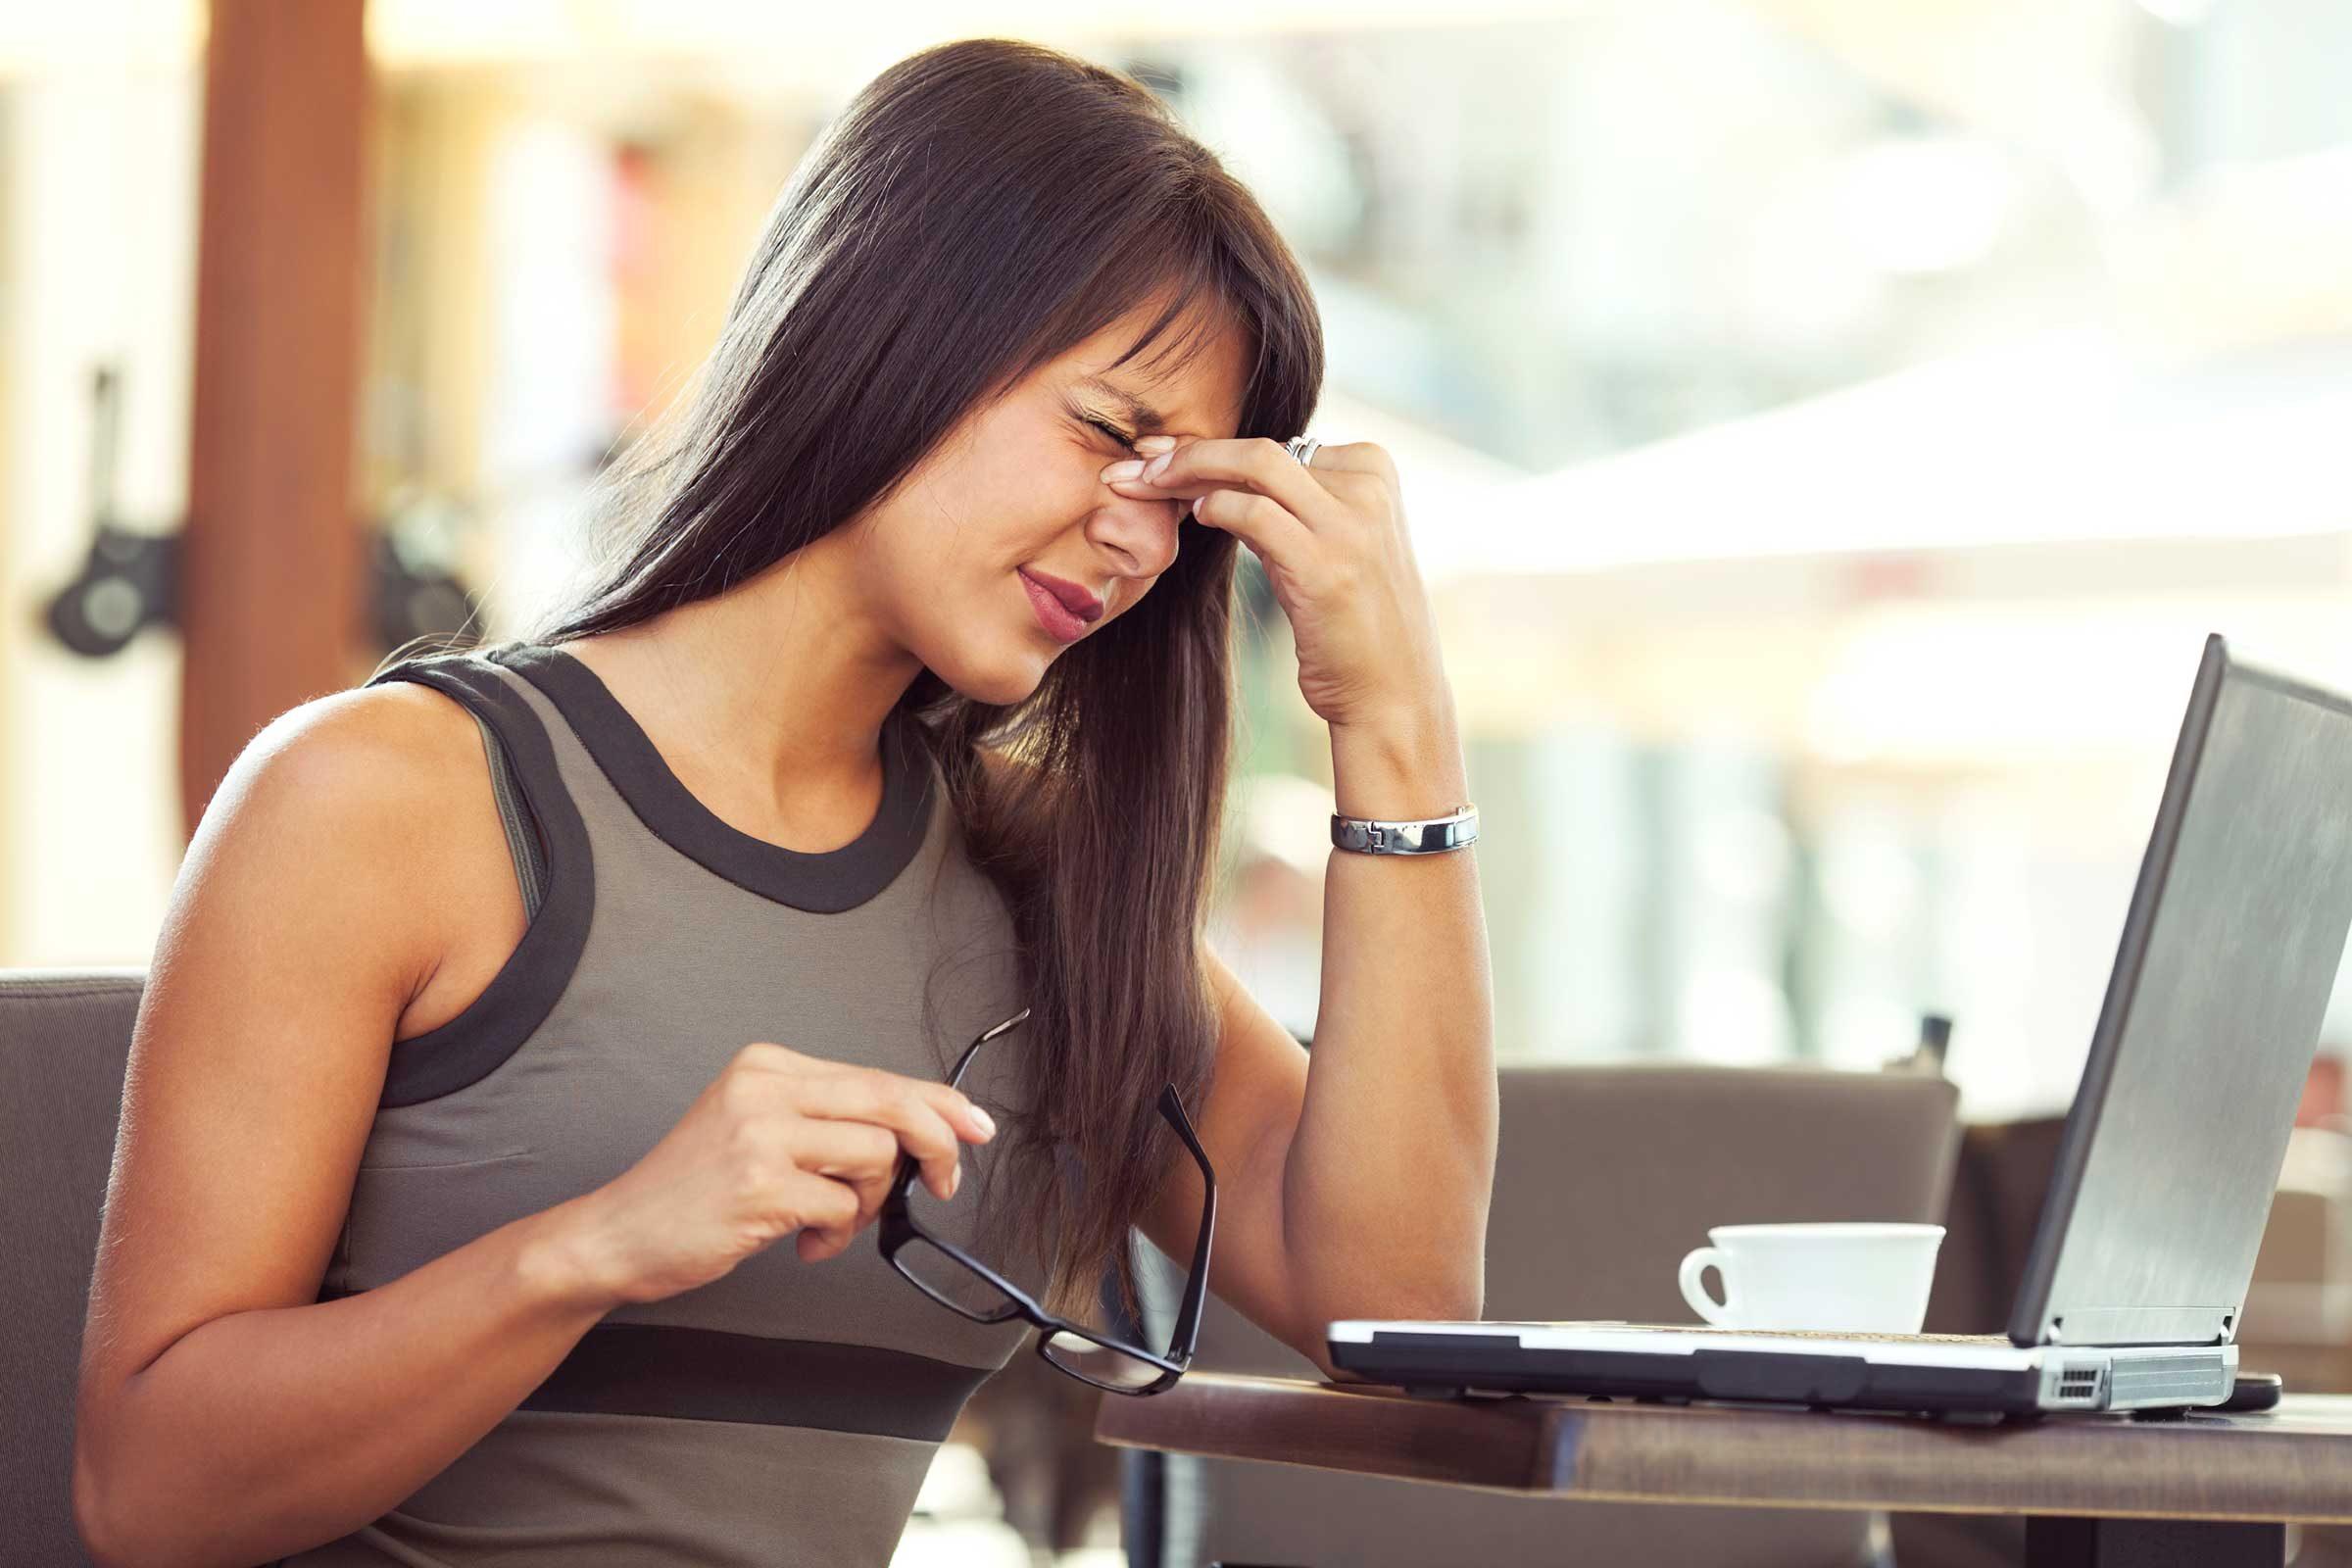 stress l 39 anxi t vous rend malade 8 sympt mes et signaux. Black Bedroom Furniture Sets. Home Design Ideas